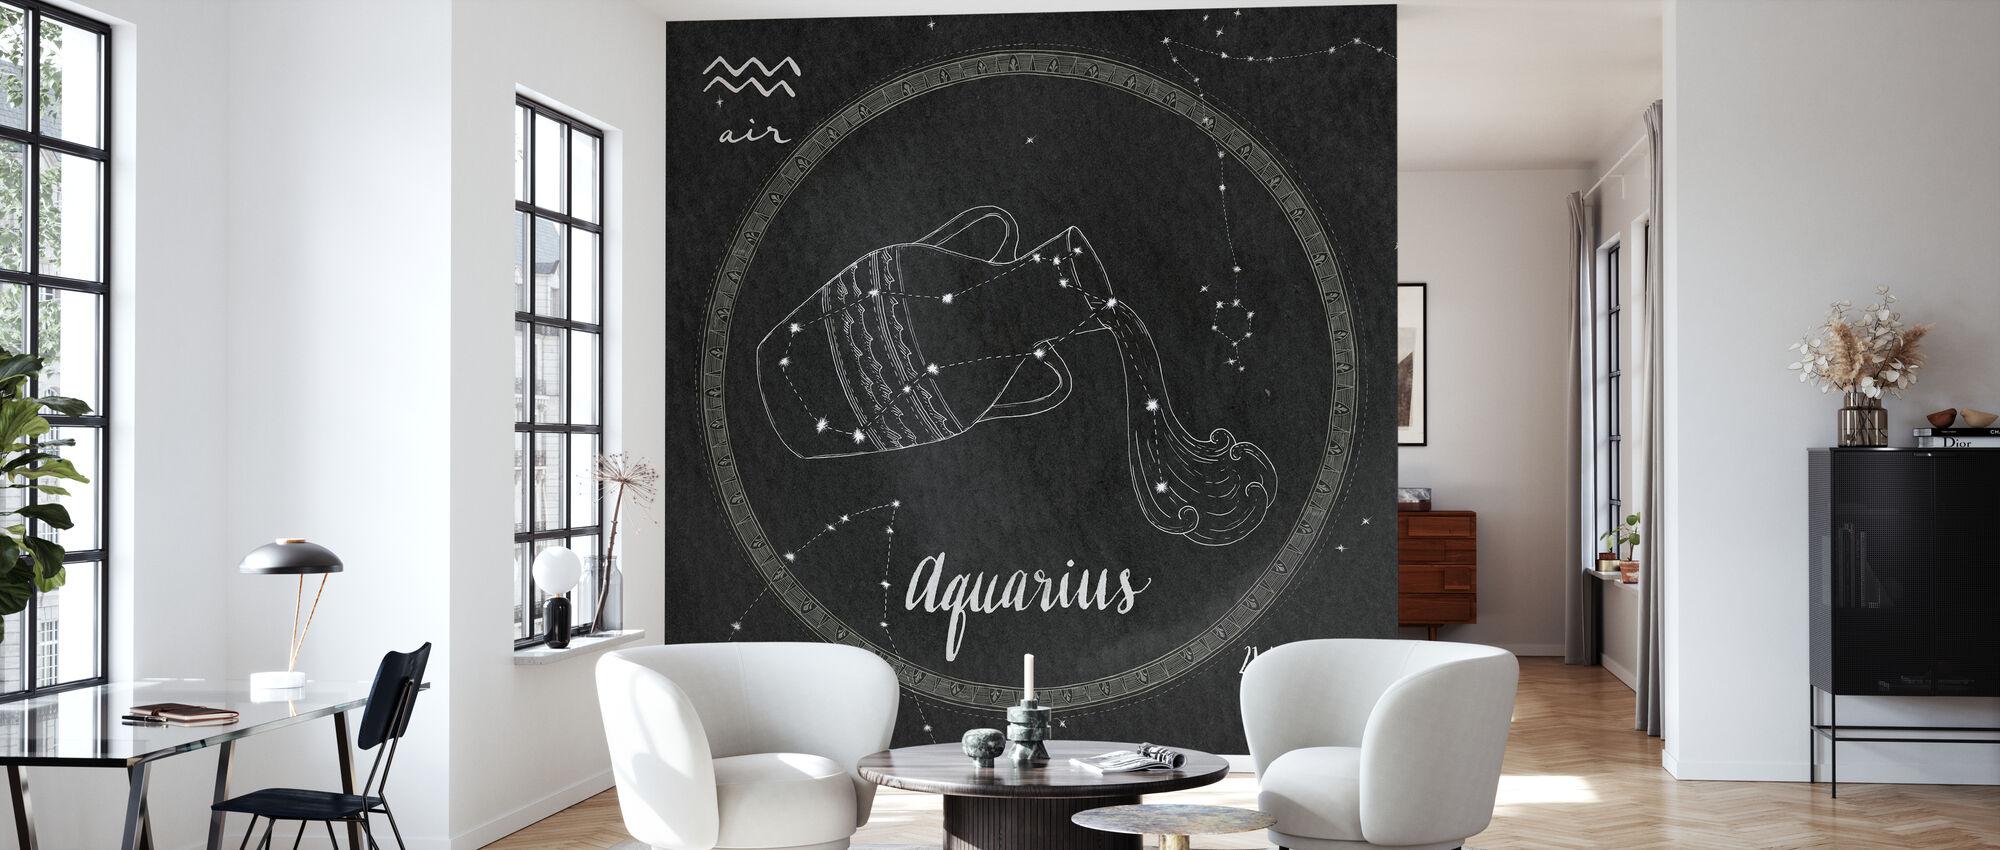 Night Sky Aquarius - Wallpaper - Living Room